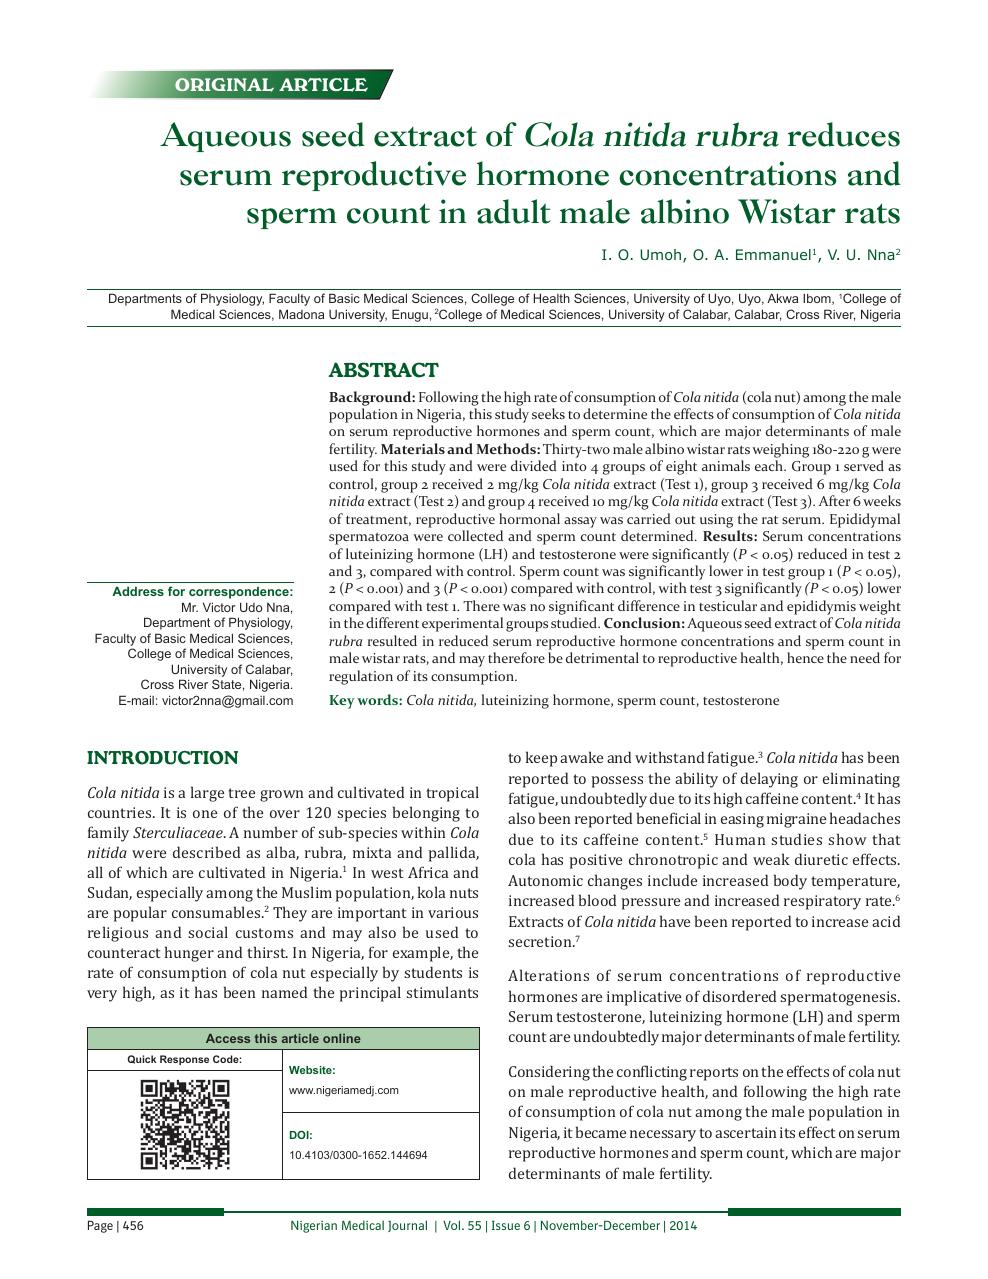 Aqueous seed extract of Cola nitida rubra reduces serum reproductive